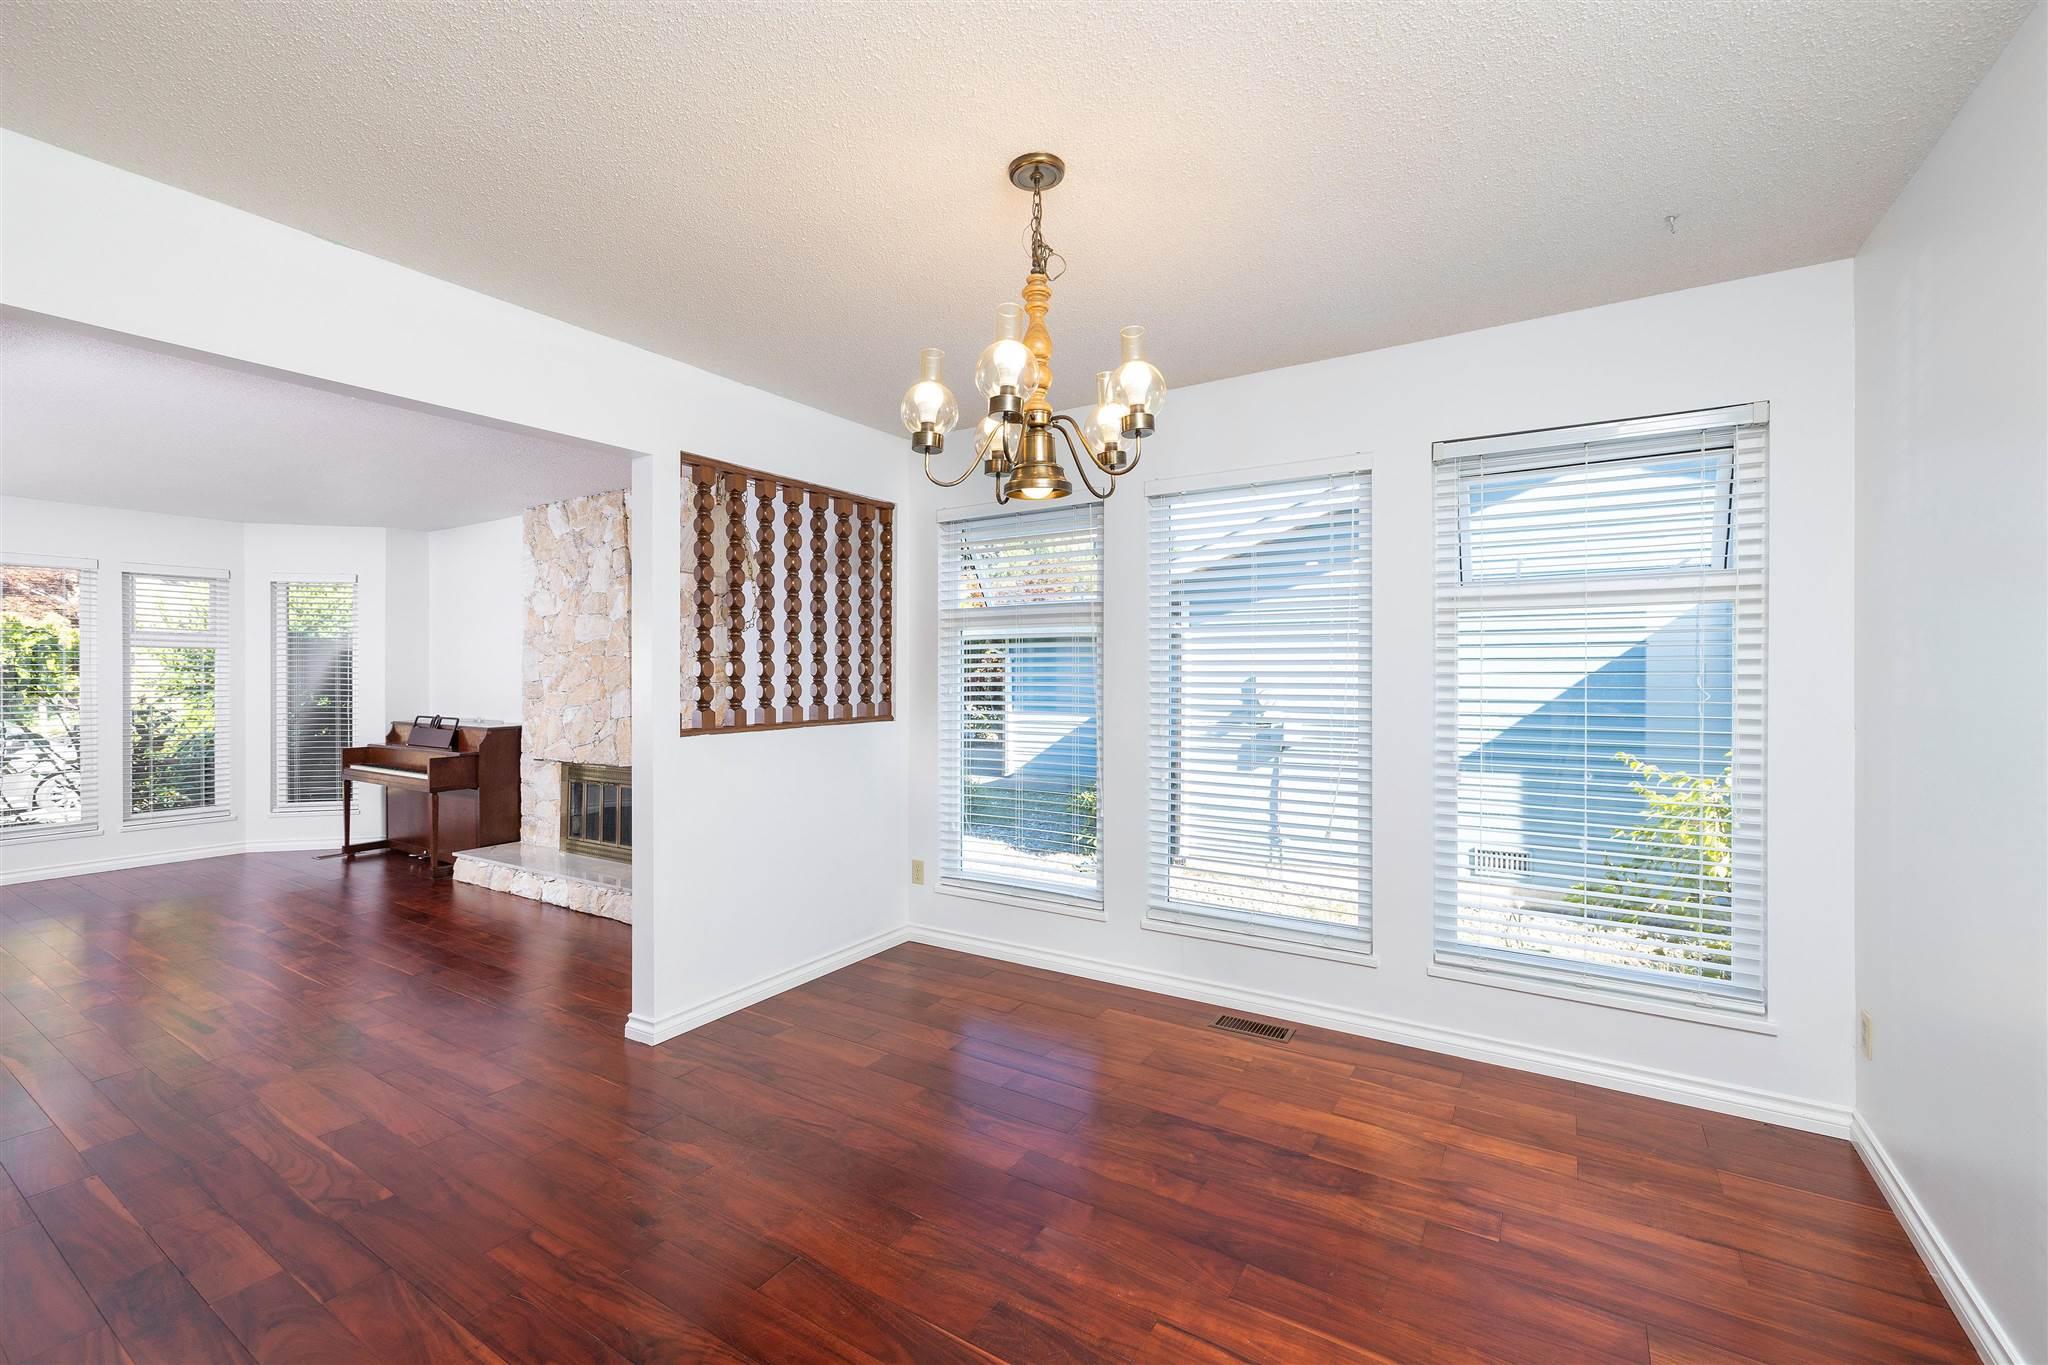 1743 148A STREET - Sunnyside Park Surrey House/Single Family for sale, 3 Bedrooms (R2604804) - #3